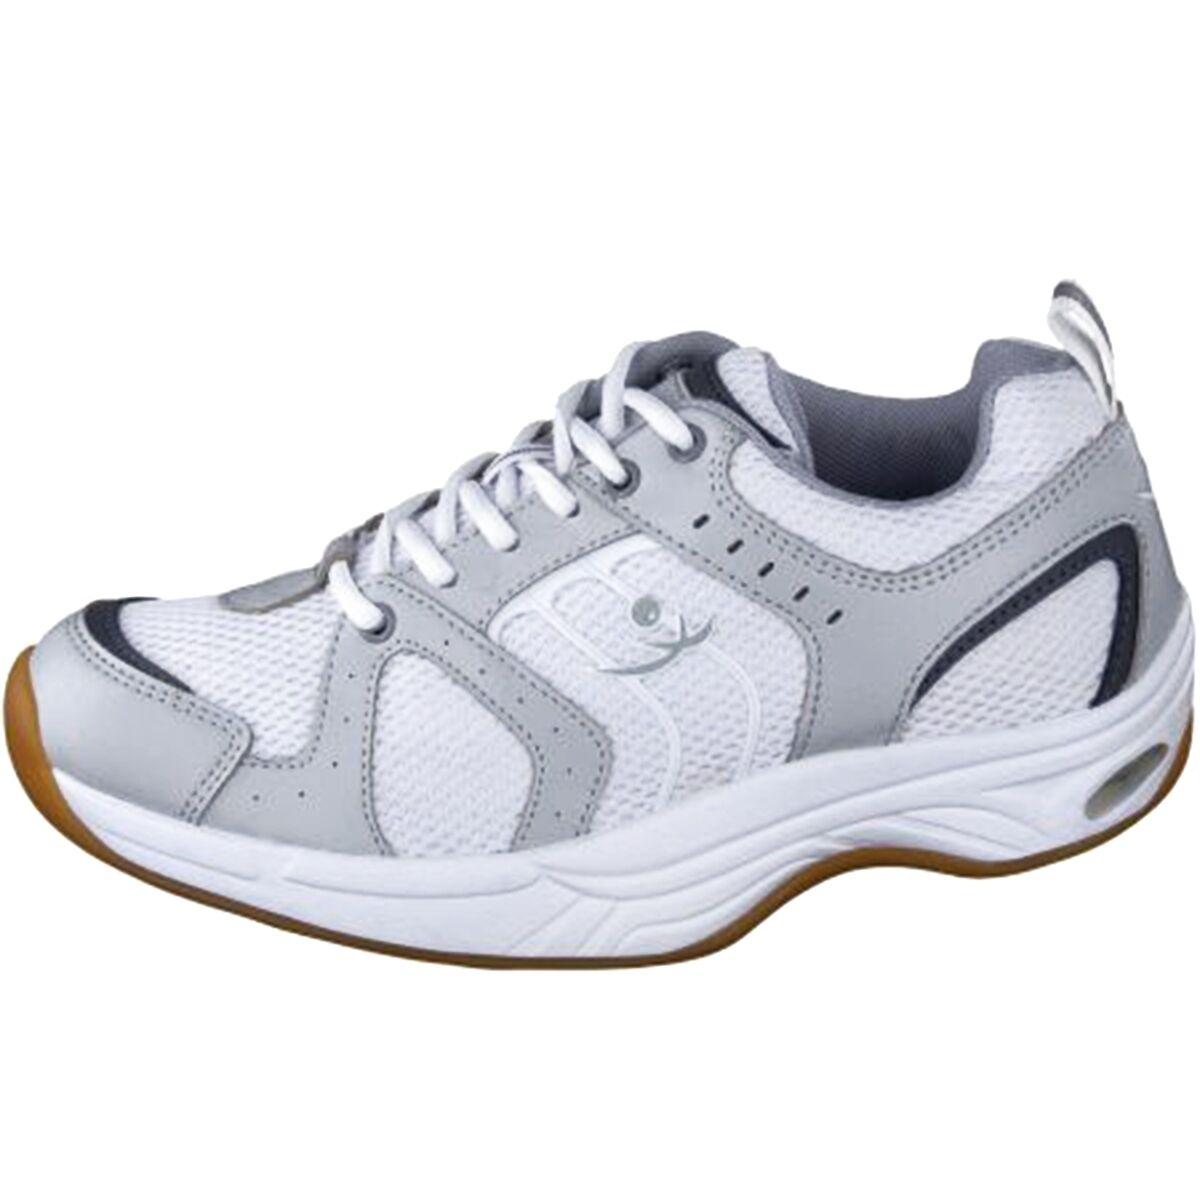 Chung Shi AuBioRiG Comfort Step Tokyo WOMEN Chaussures Femmes Dos Chaussure 9102345